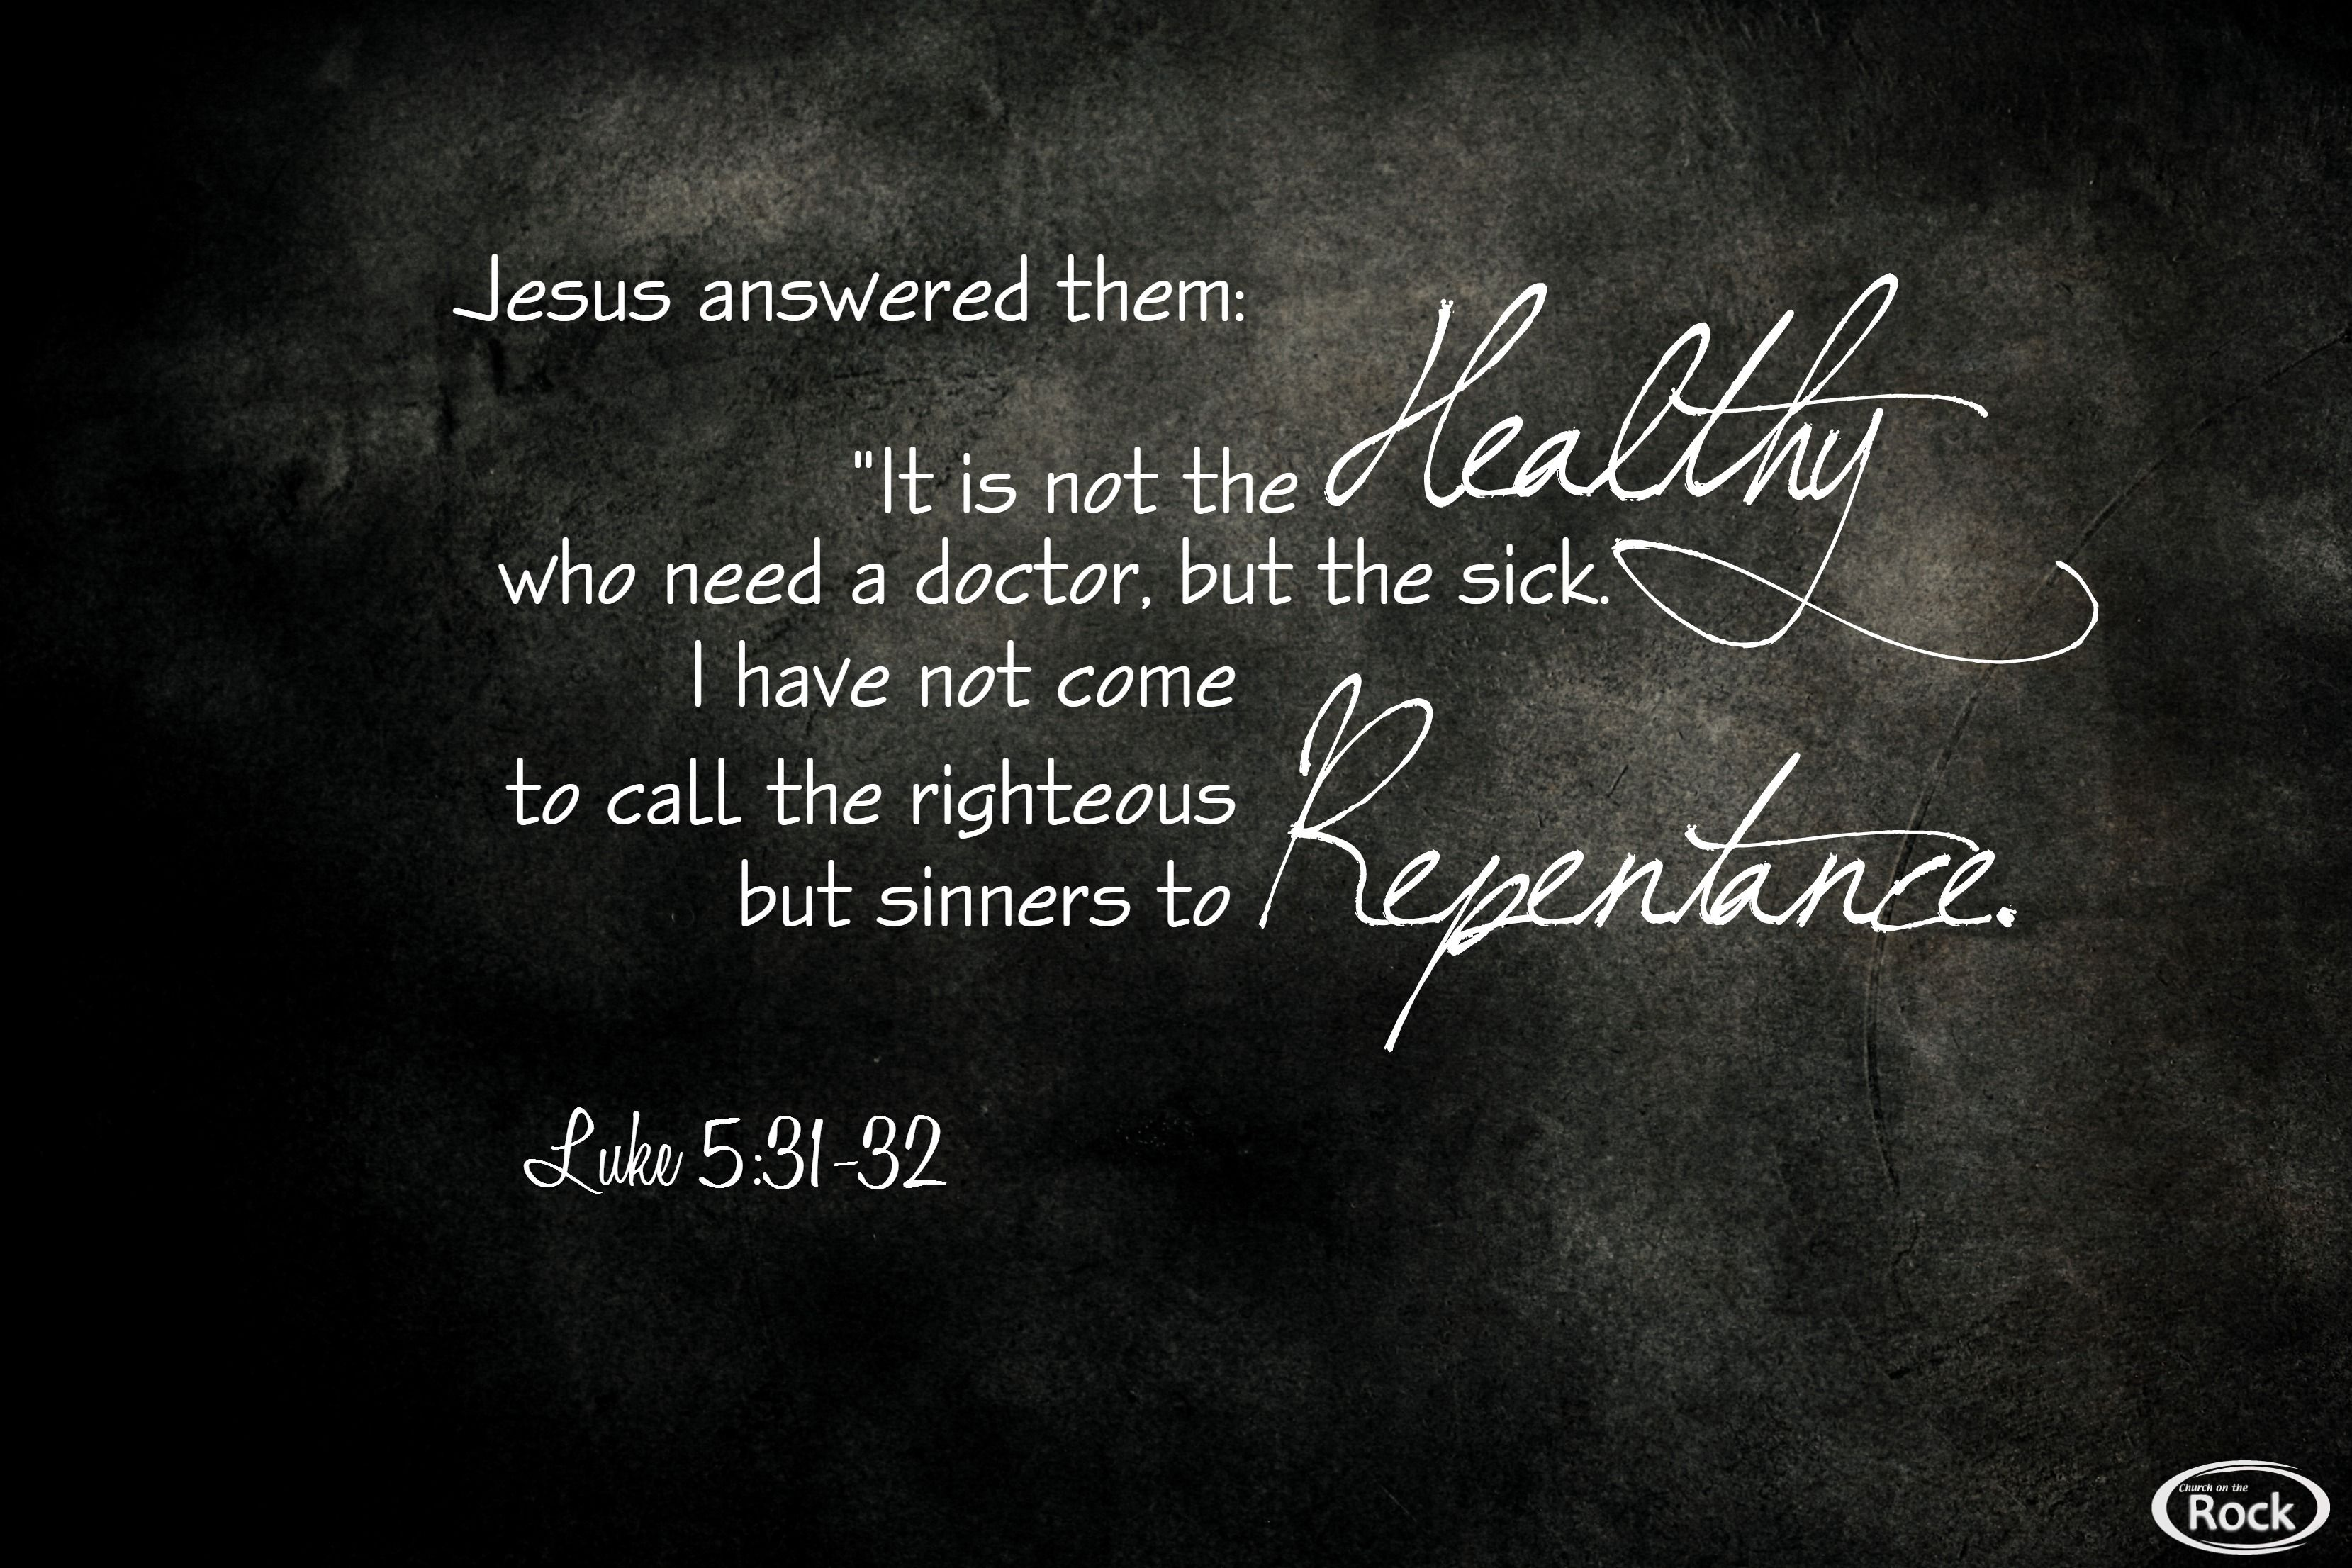 Luke 5:31-32 | Quotes/Scripture | Scripture art, Gods love, Art